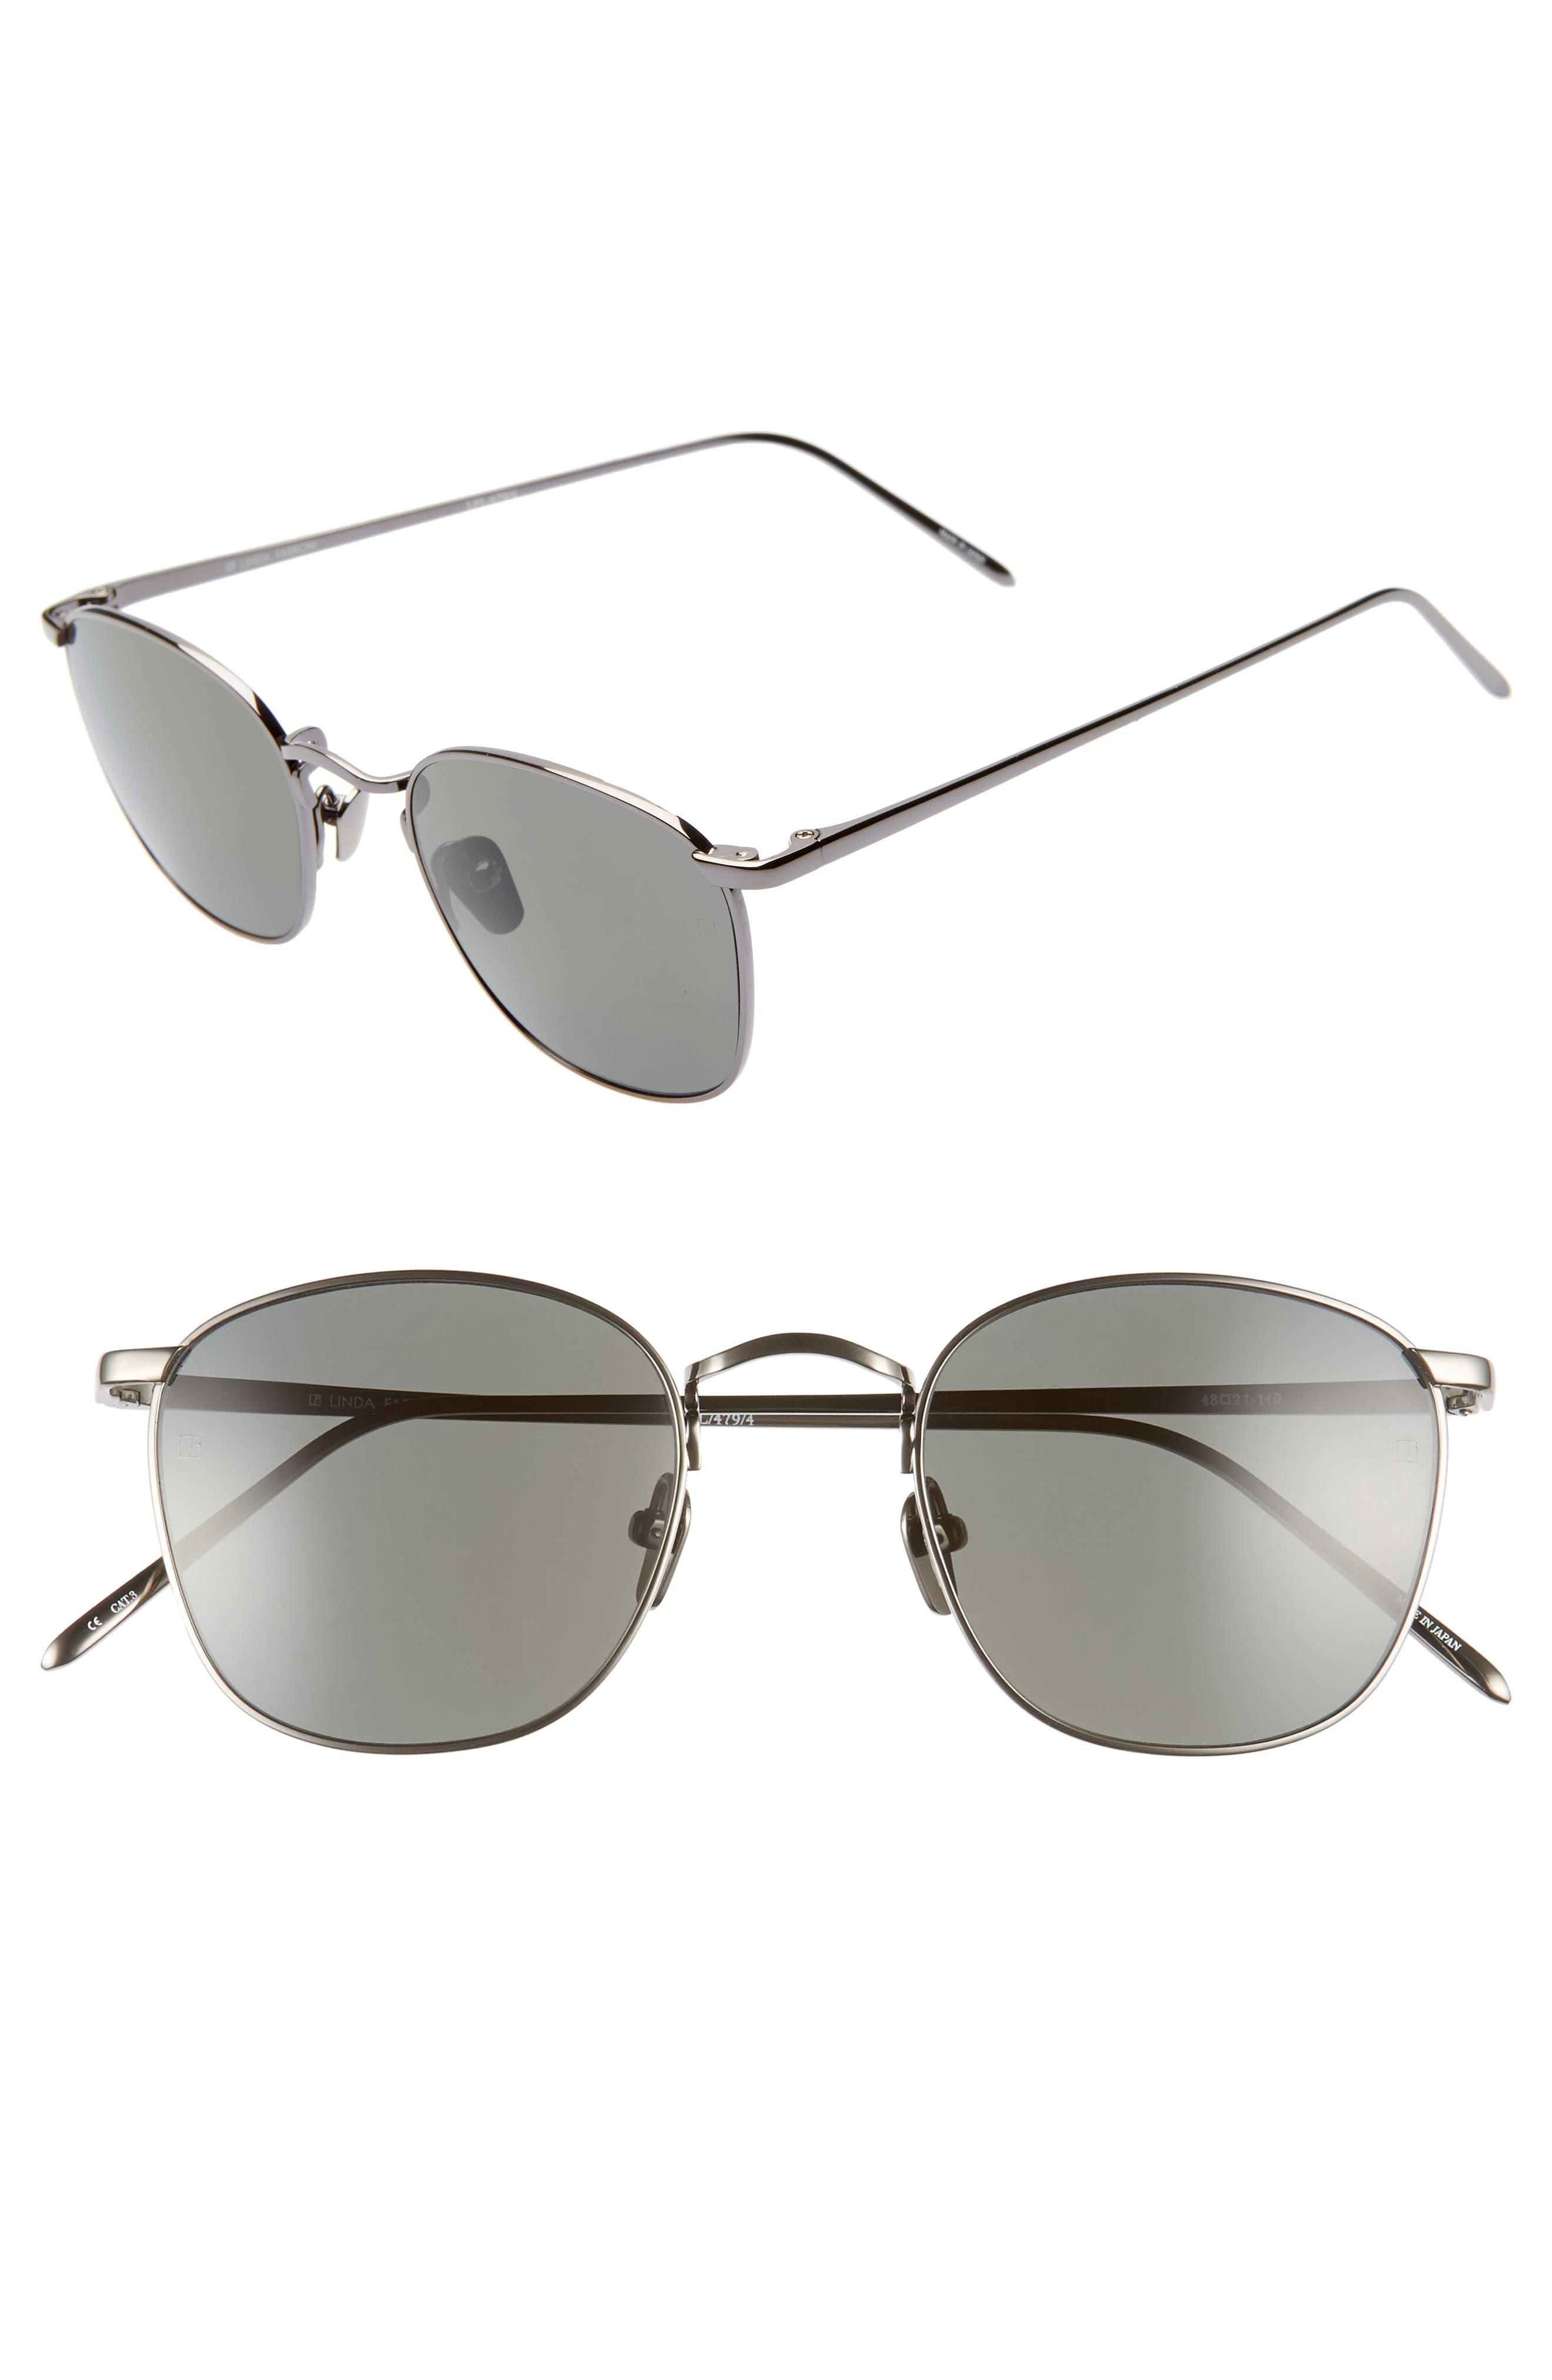 LINDA FARROW 48mm Square Sunglasses, Main, color, DARK NICKEL